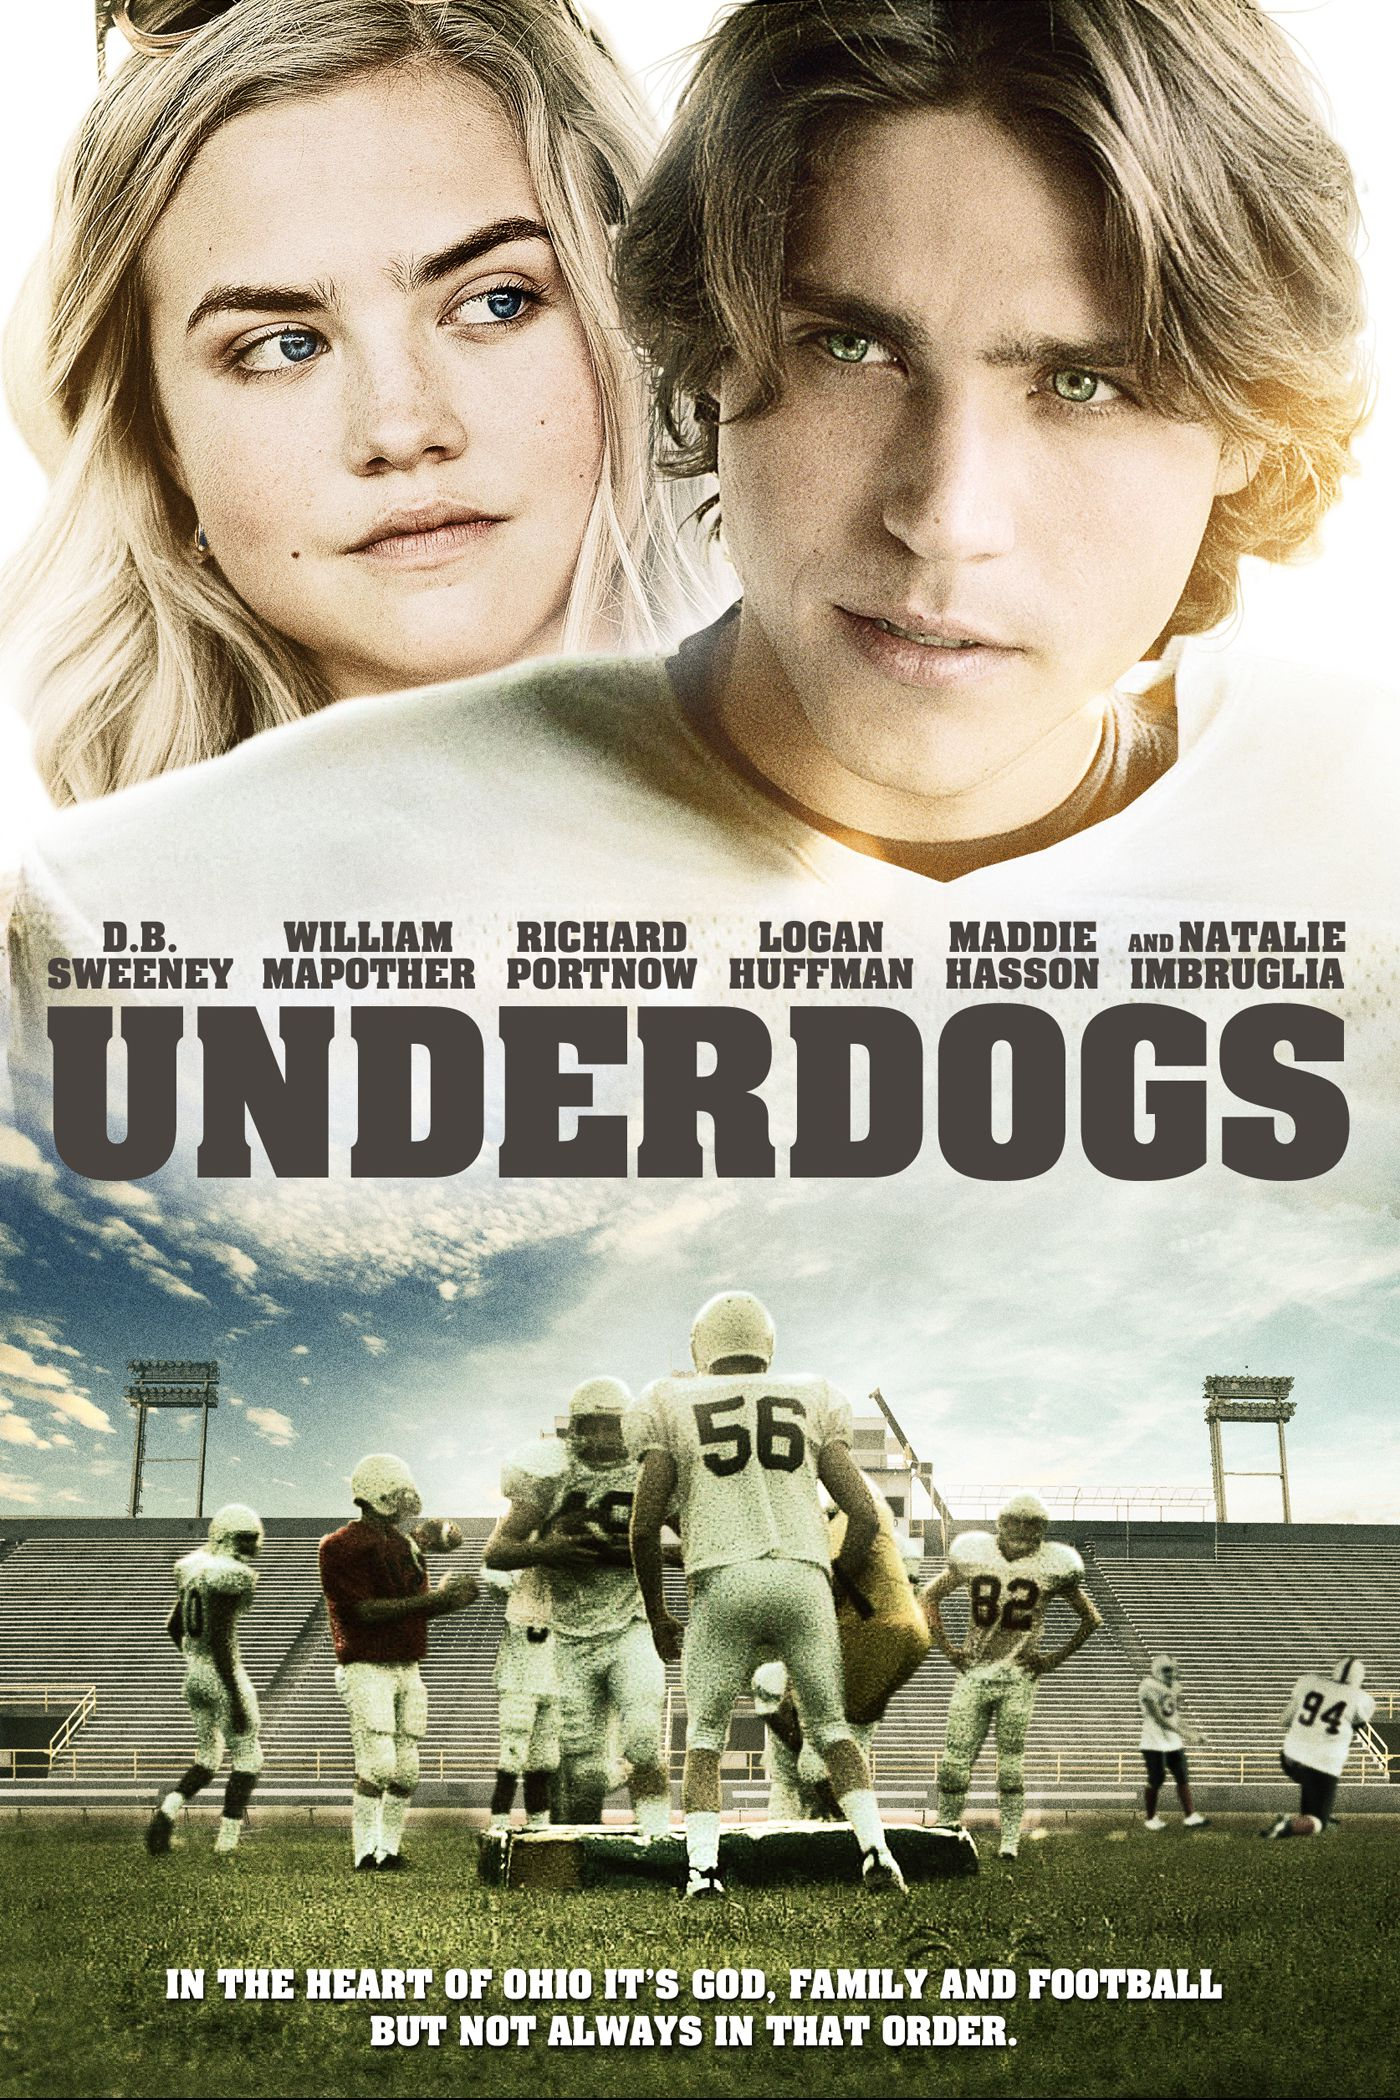 Underdogs - Film (2013)